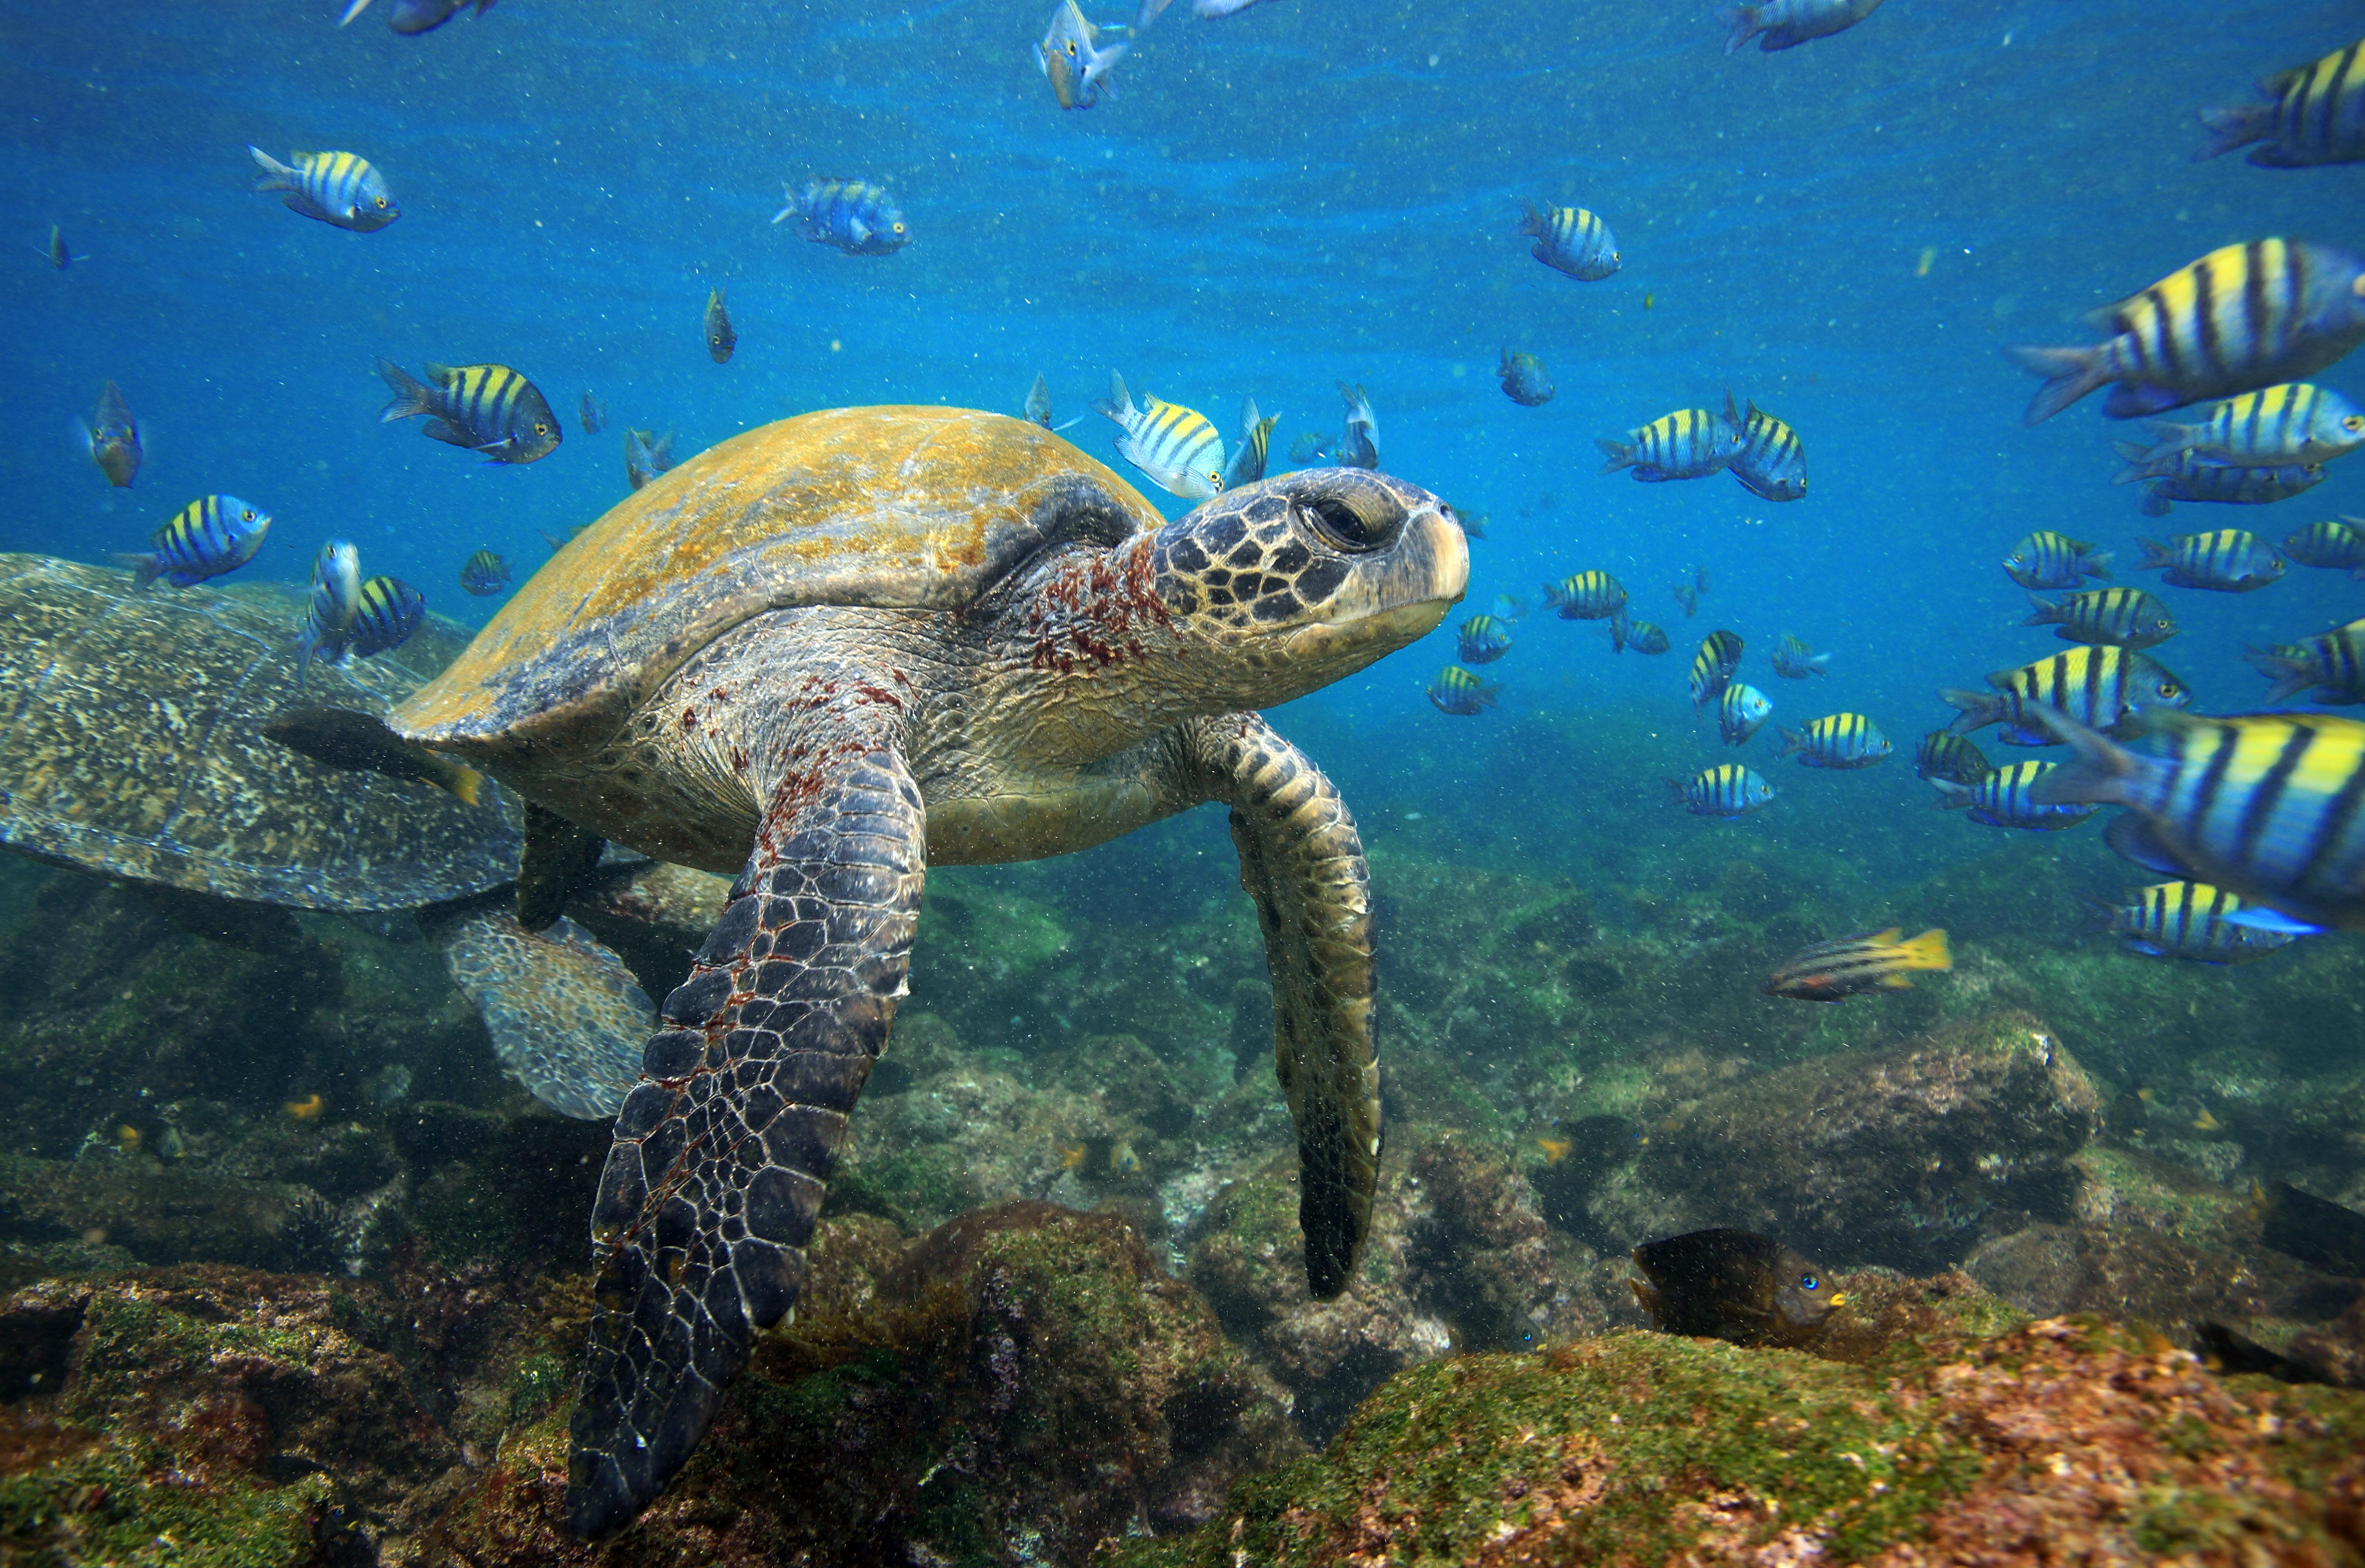 Sea turtles in lagoon, Galapagos Islands